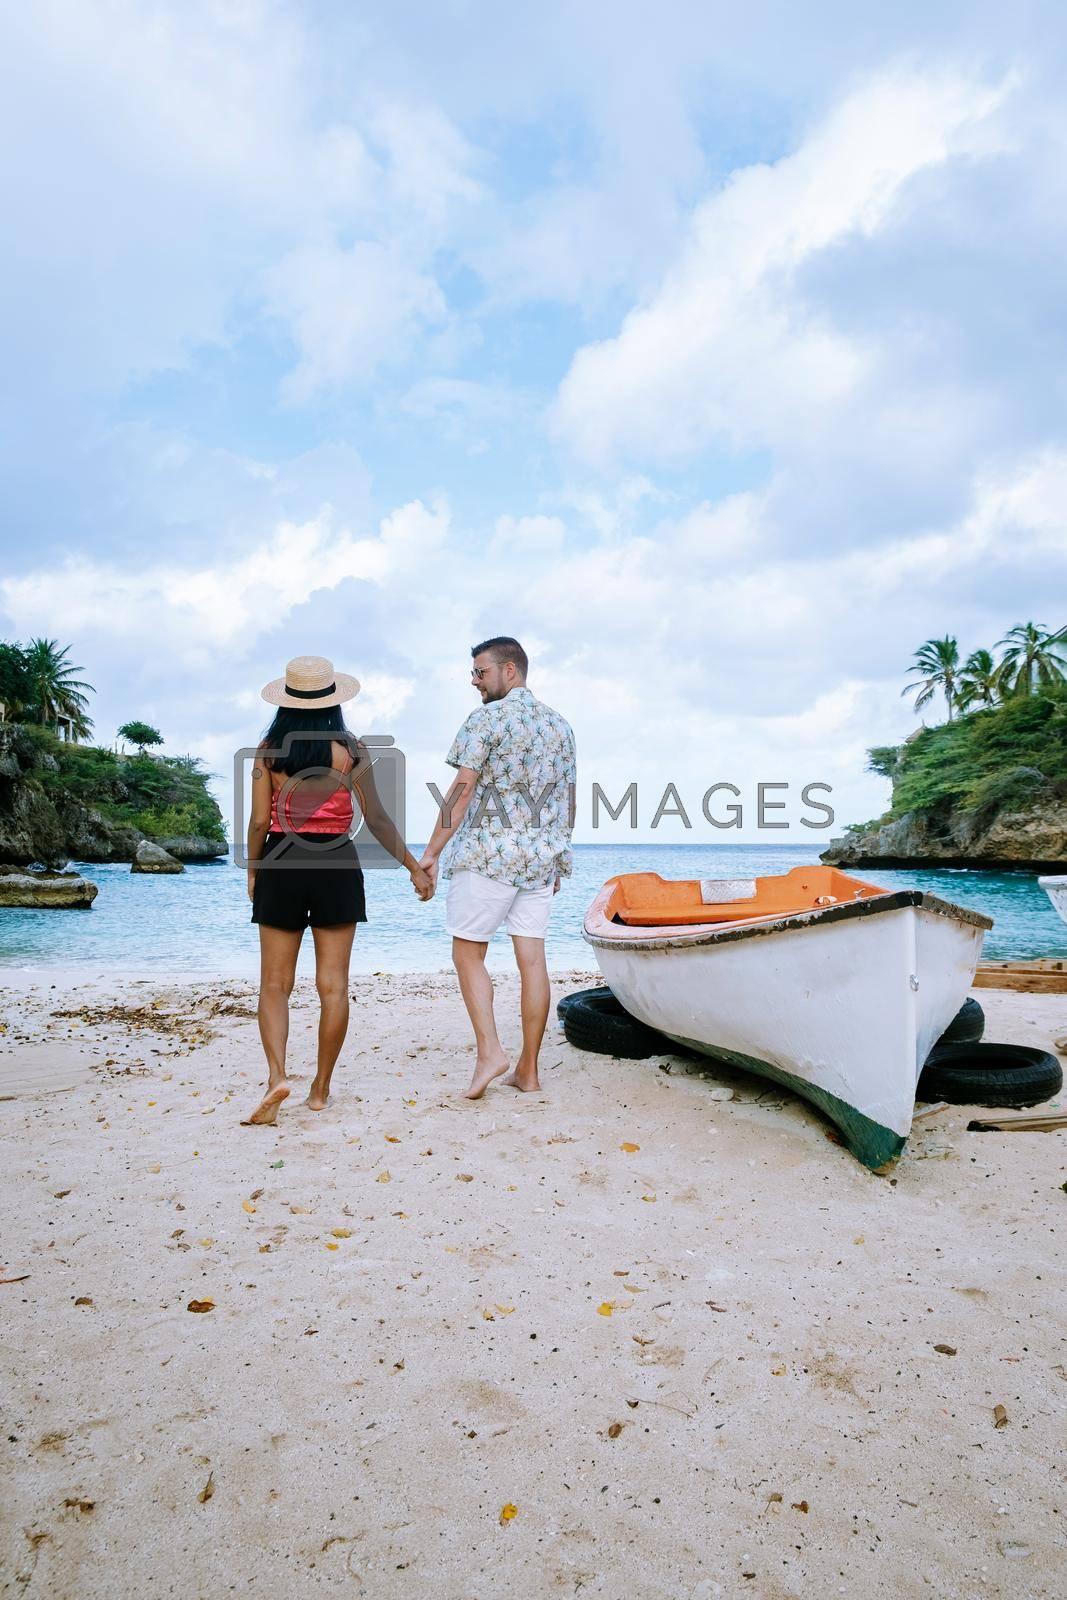 Playa Lagun Beach Cliff Curacao, beautiful tropical bay with white sand and blue ocean Curacao Caribbean, men and woman mid age couple on tropical beach